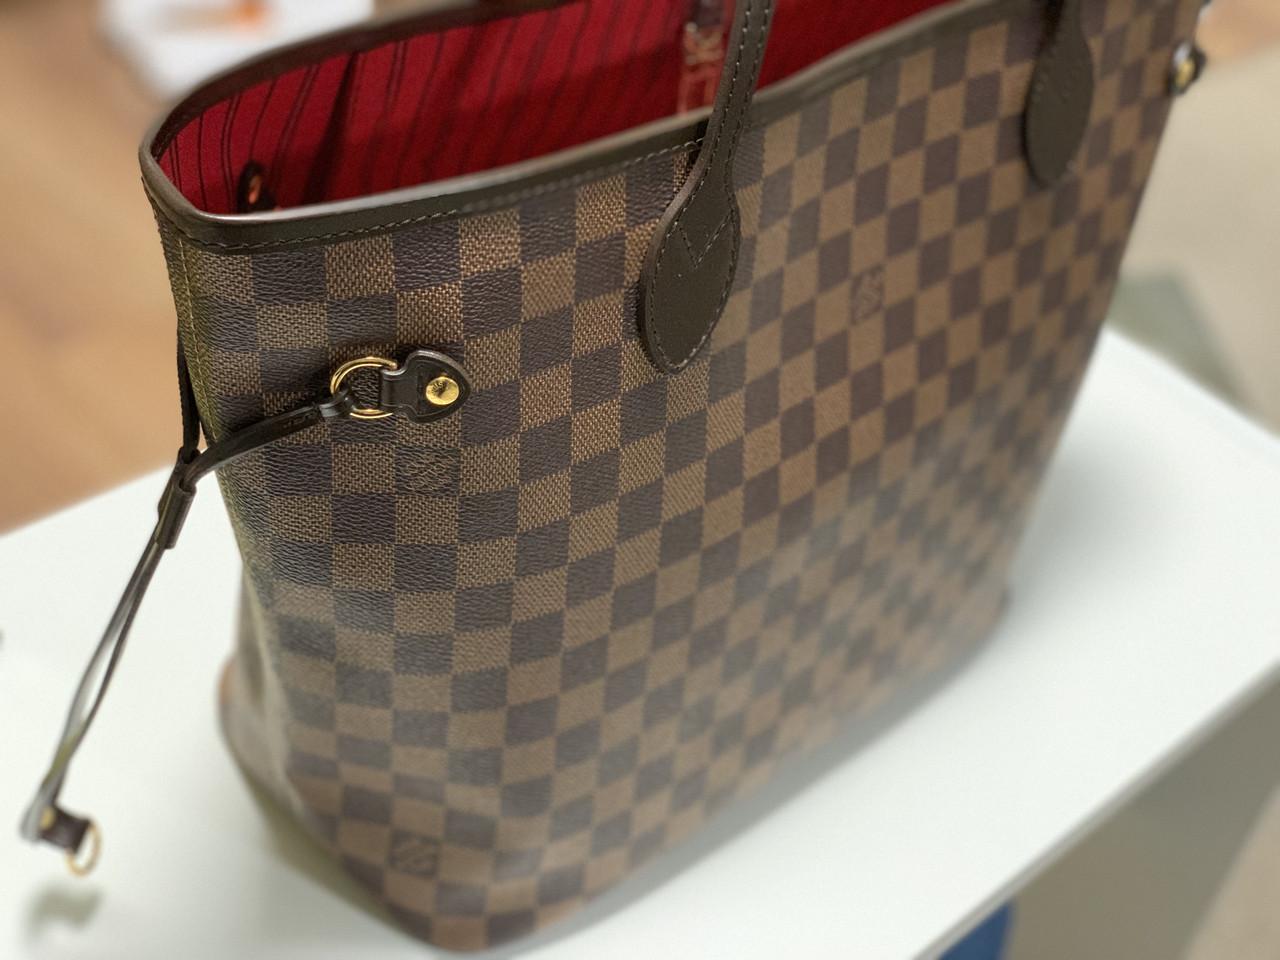 3866473c9faa Женская сумка Louis Vuitton Neverfull, фото 2 ...